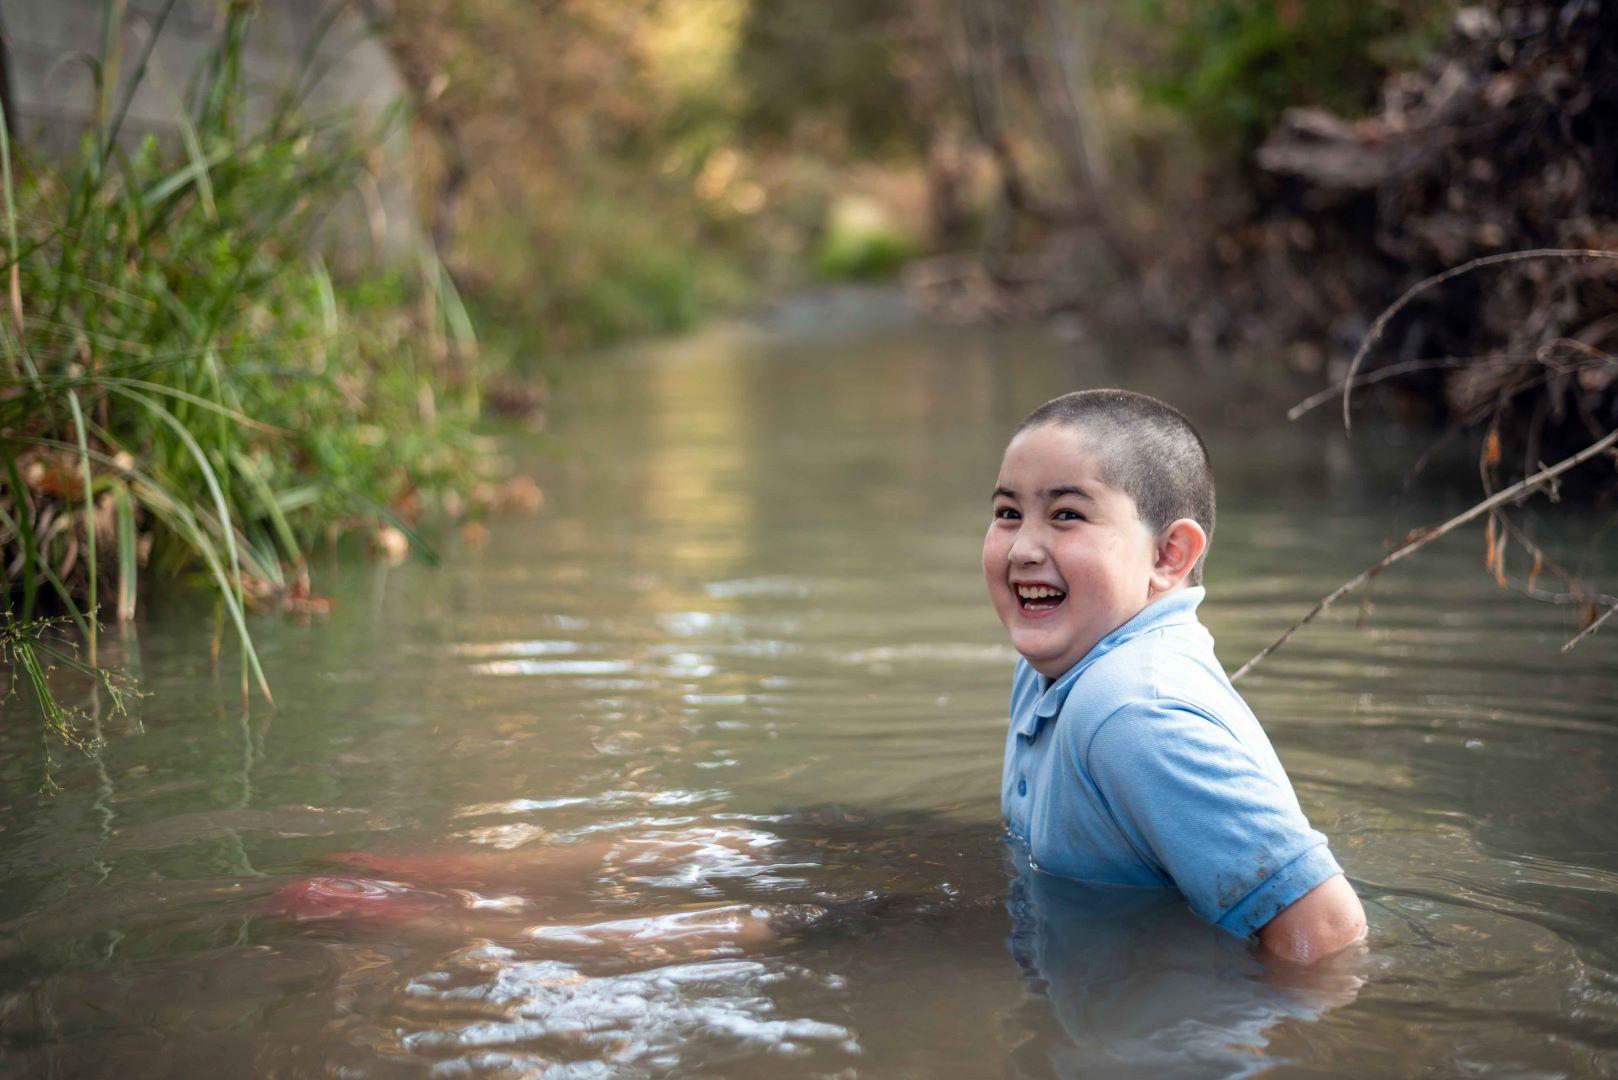 neilson kids family photography cupertino mcclellan ranch creek boy atticus